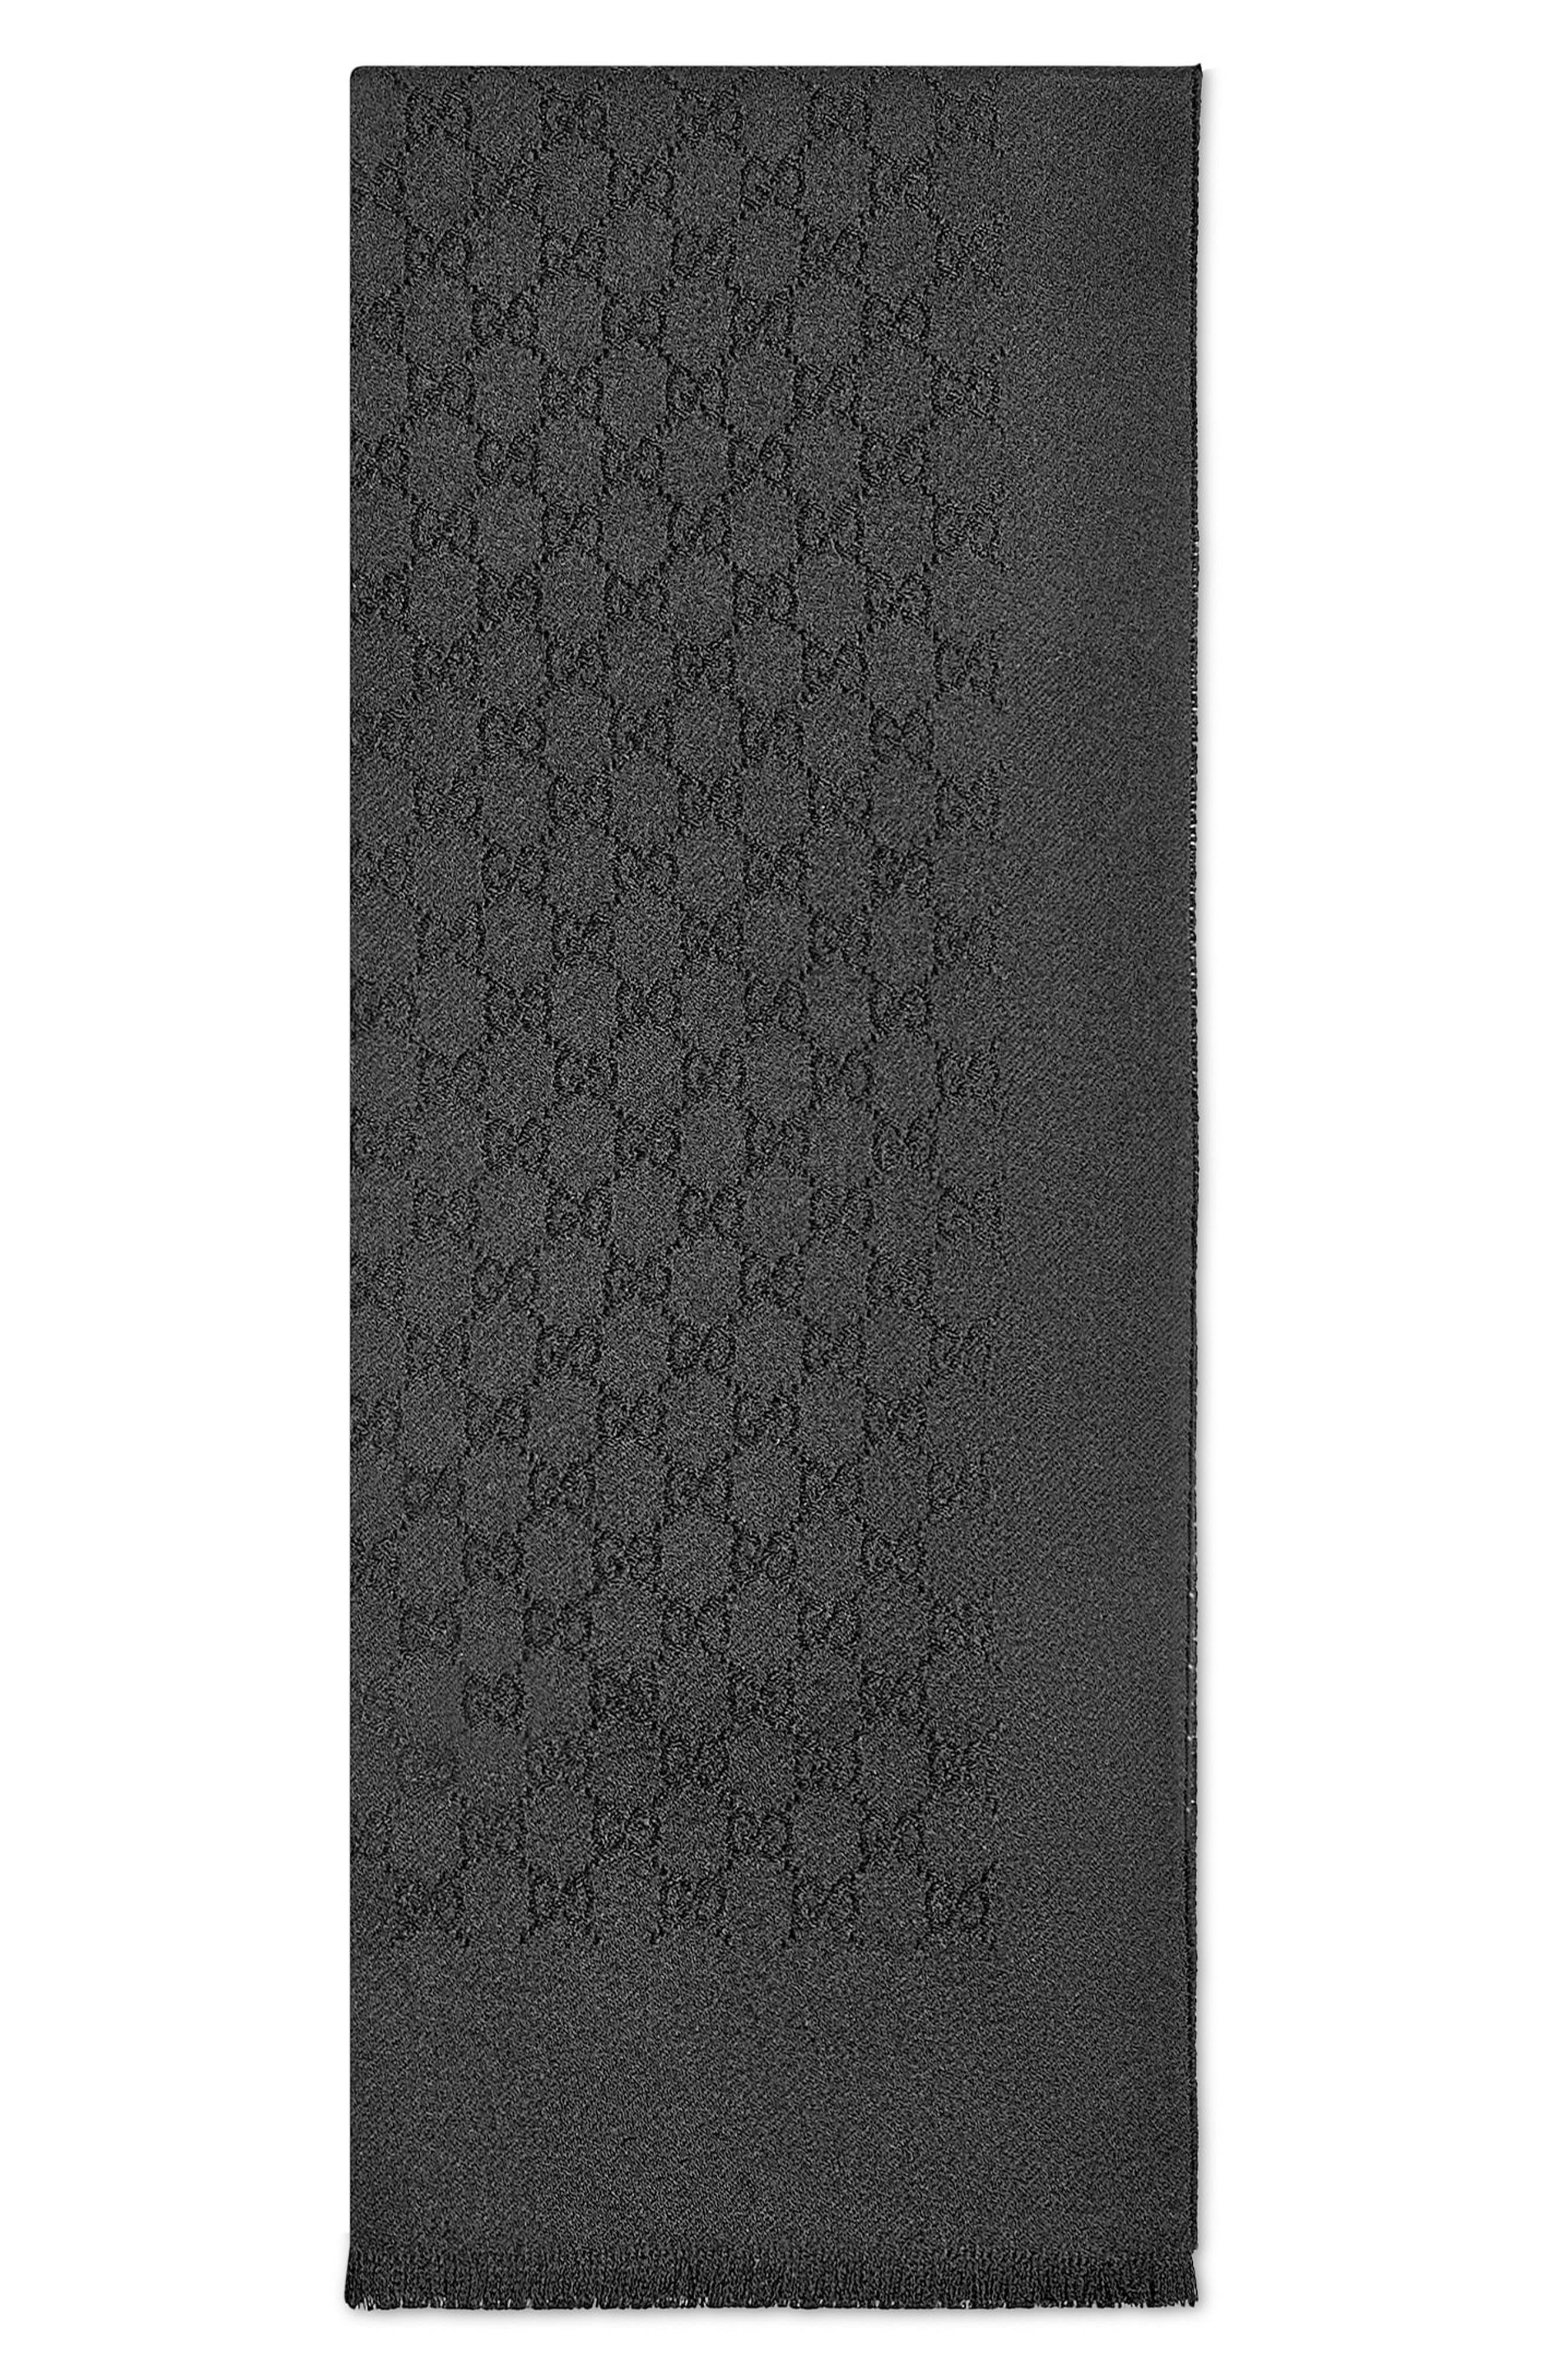 GG Gem Lux Jacquard Cashmere Scarf,                         Main,                         color, 1000 BLACK